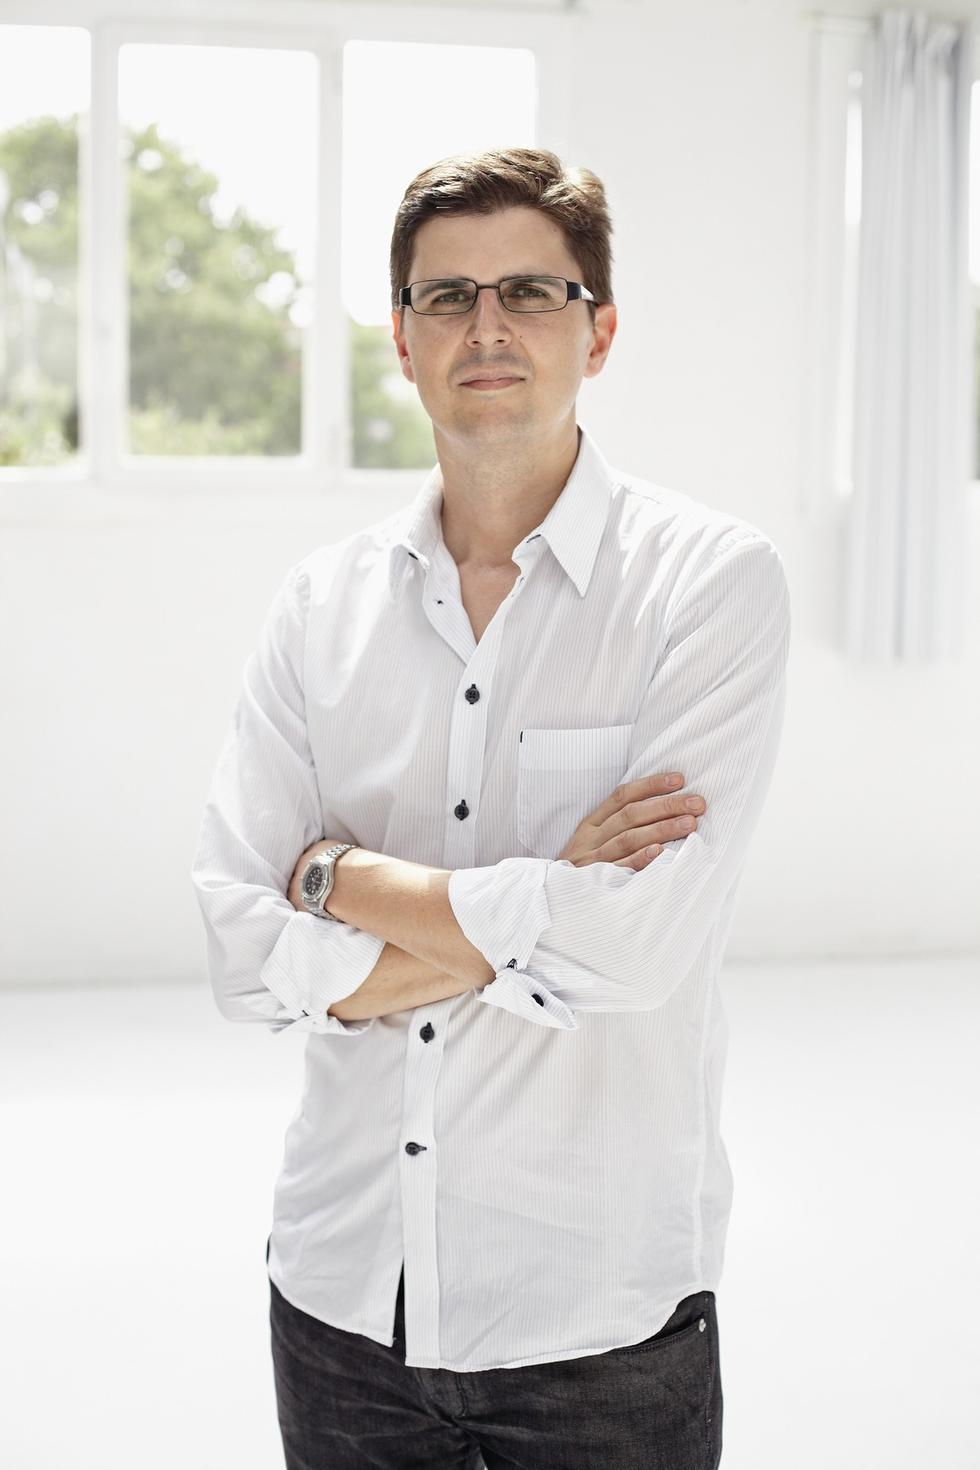 Alberto Veiga